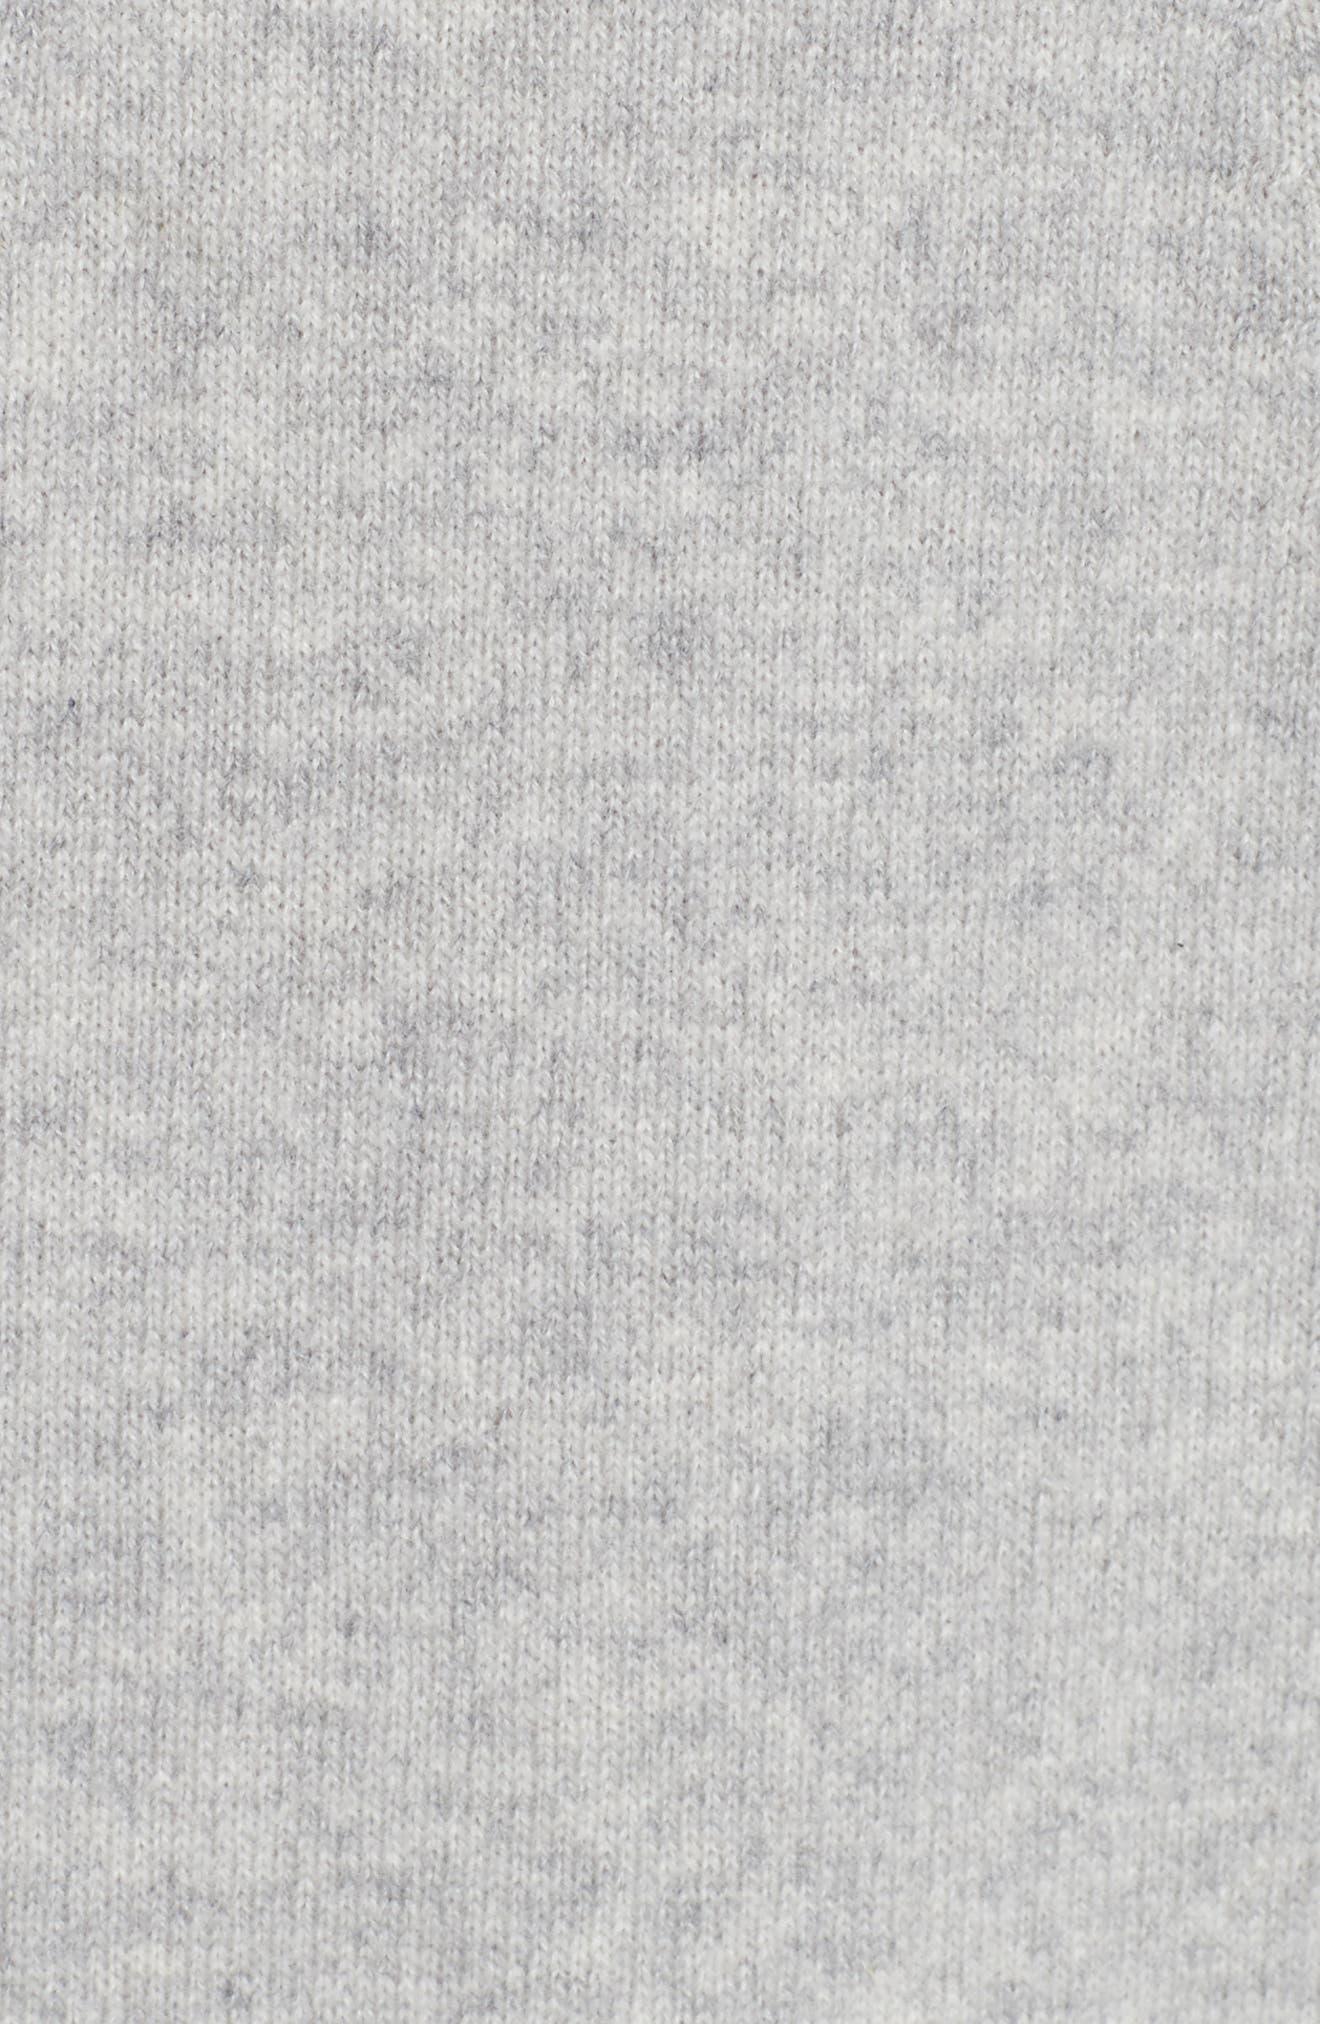 Ace Cashmere Turtleneck Sweater,                             Alternate thumbnail 5, color,                             058